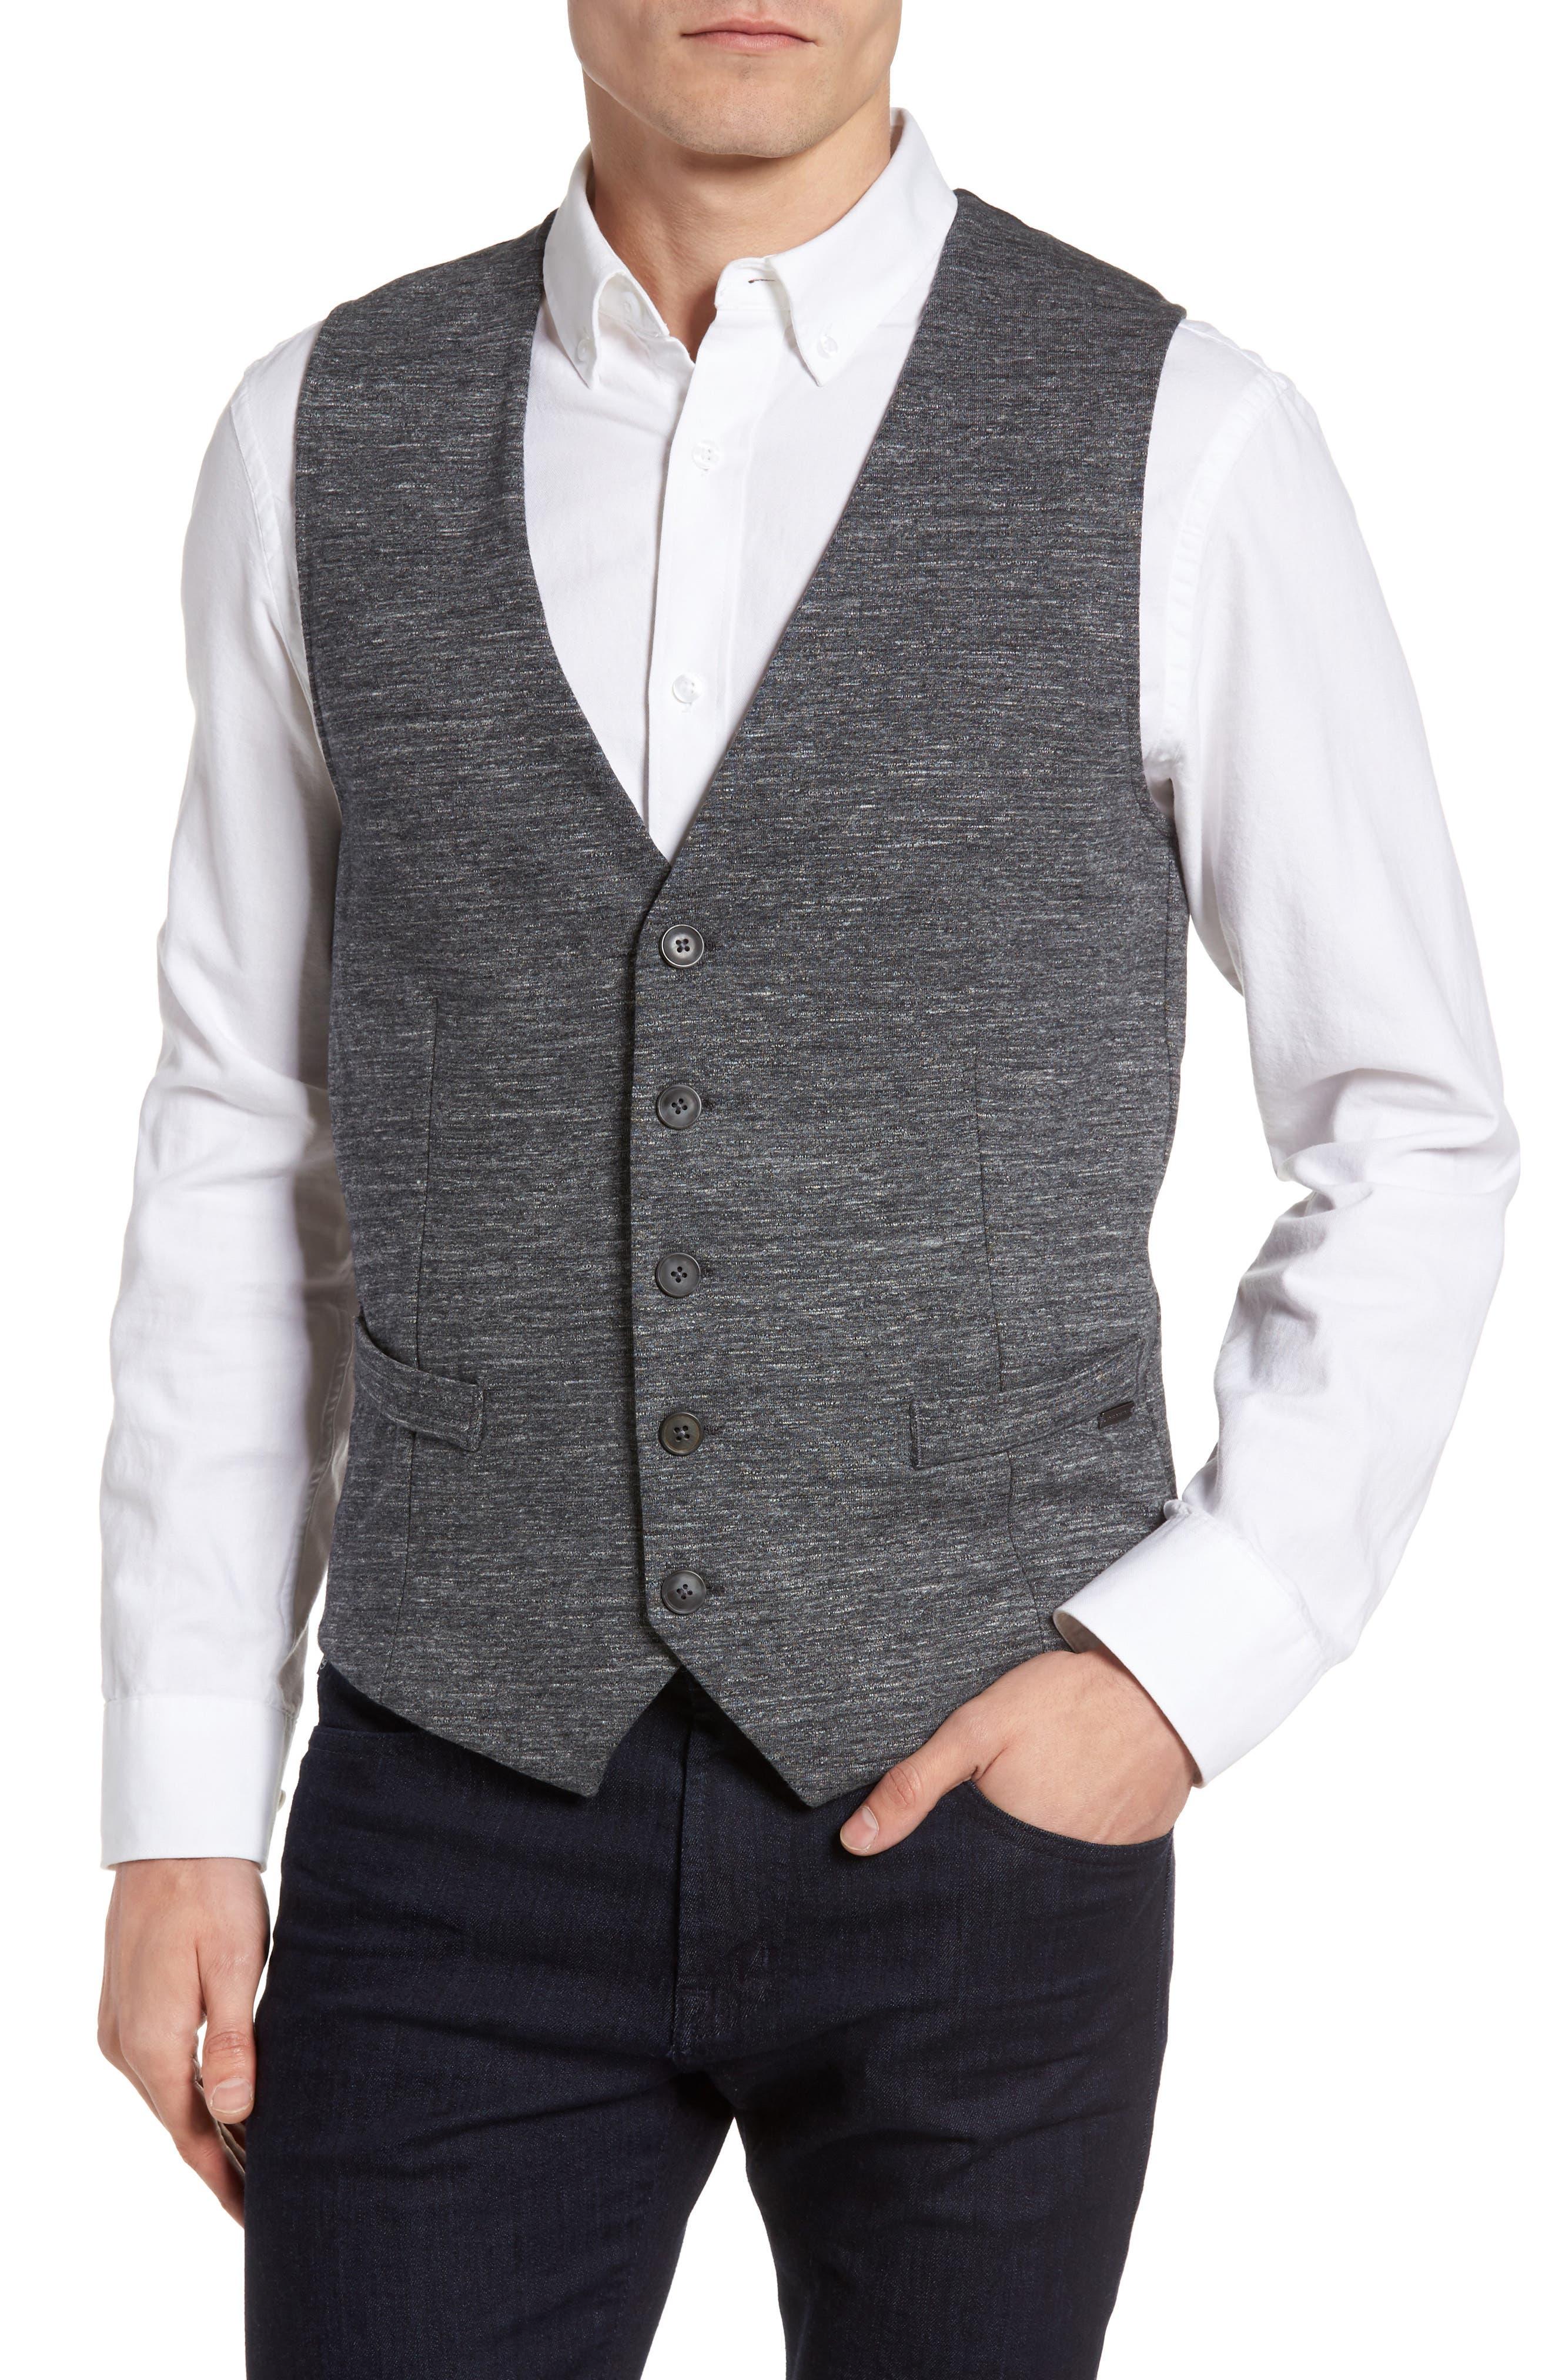 Wutang Jersey Vest,                             Main thumbnail 1, color,                             051